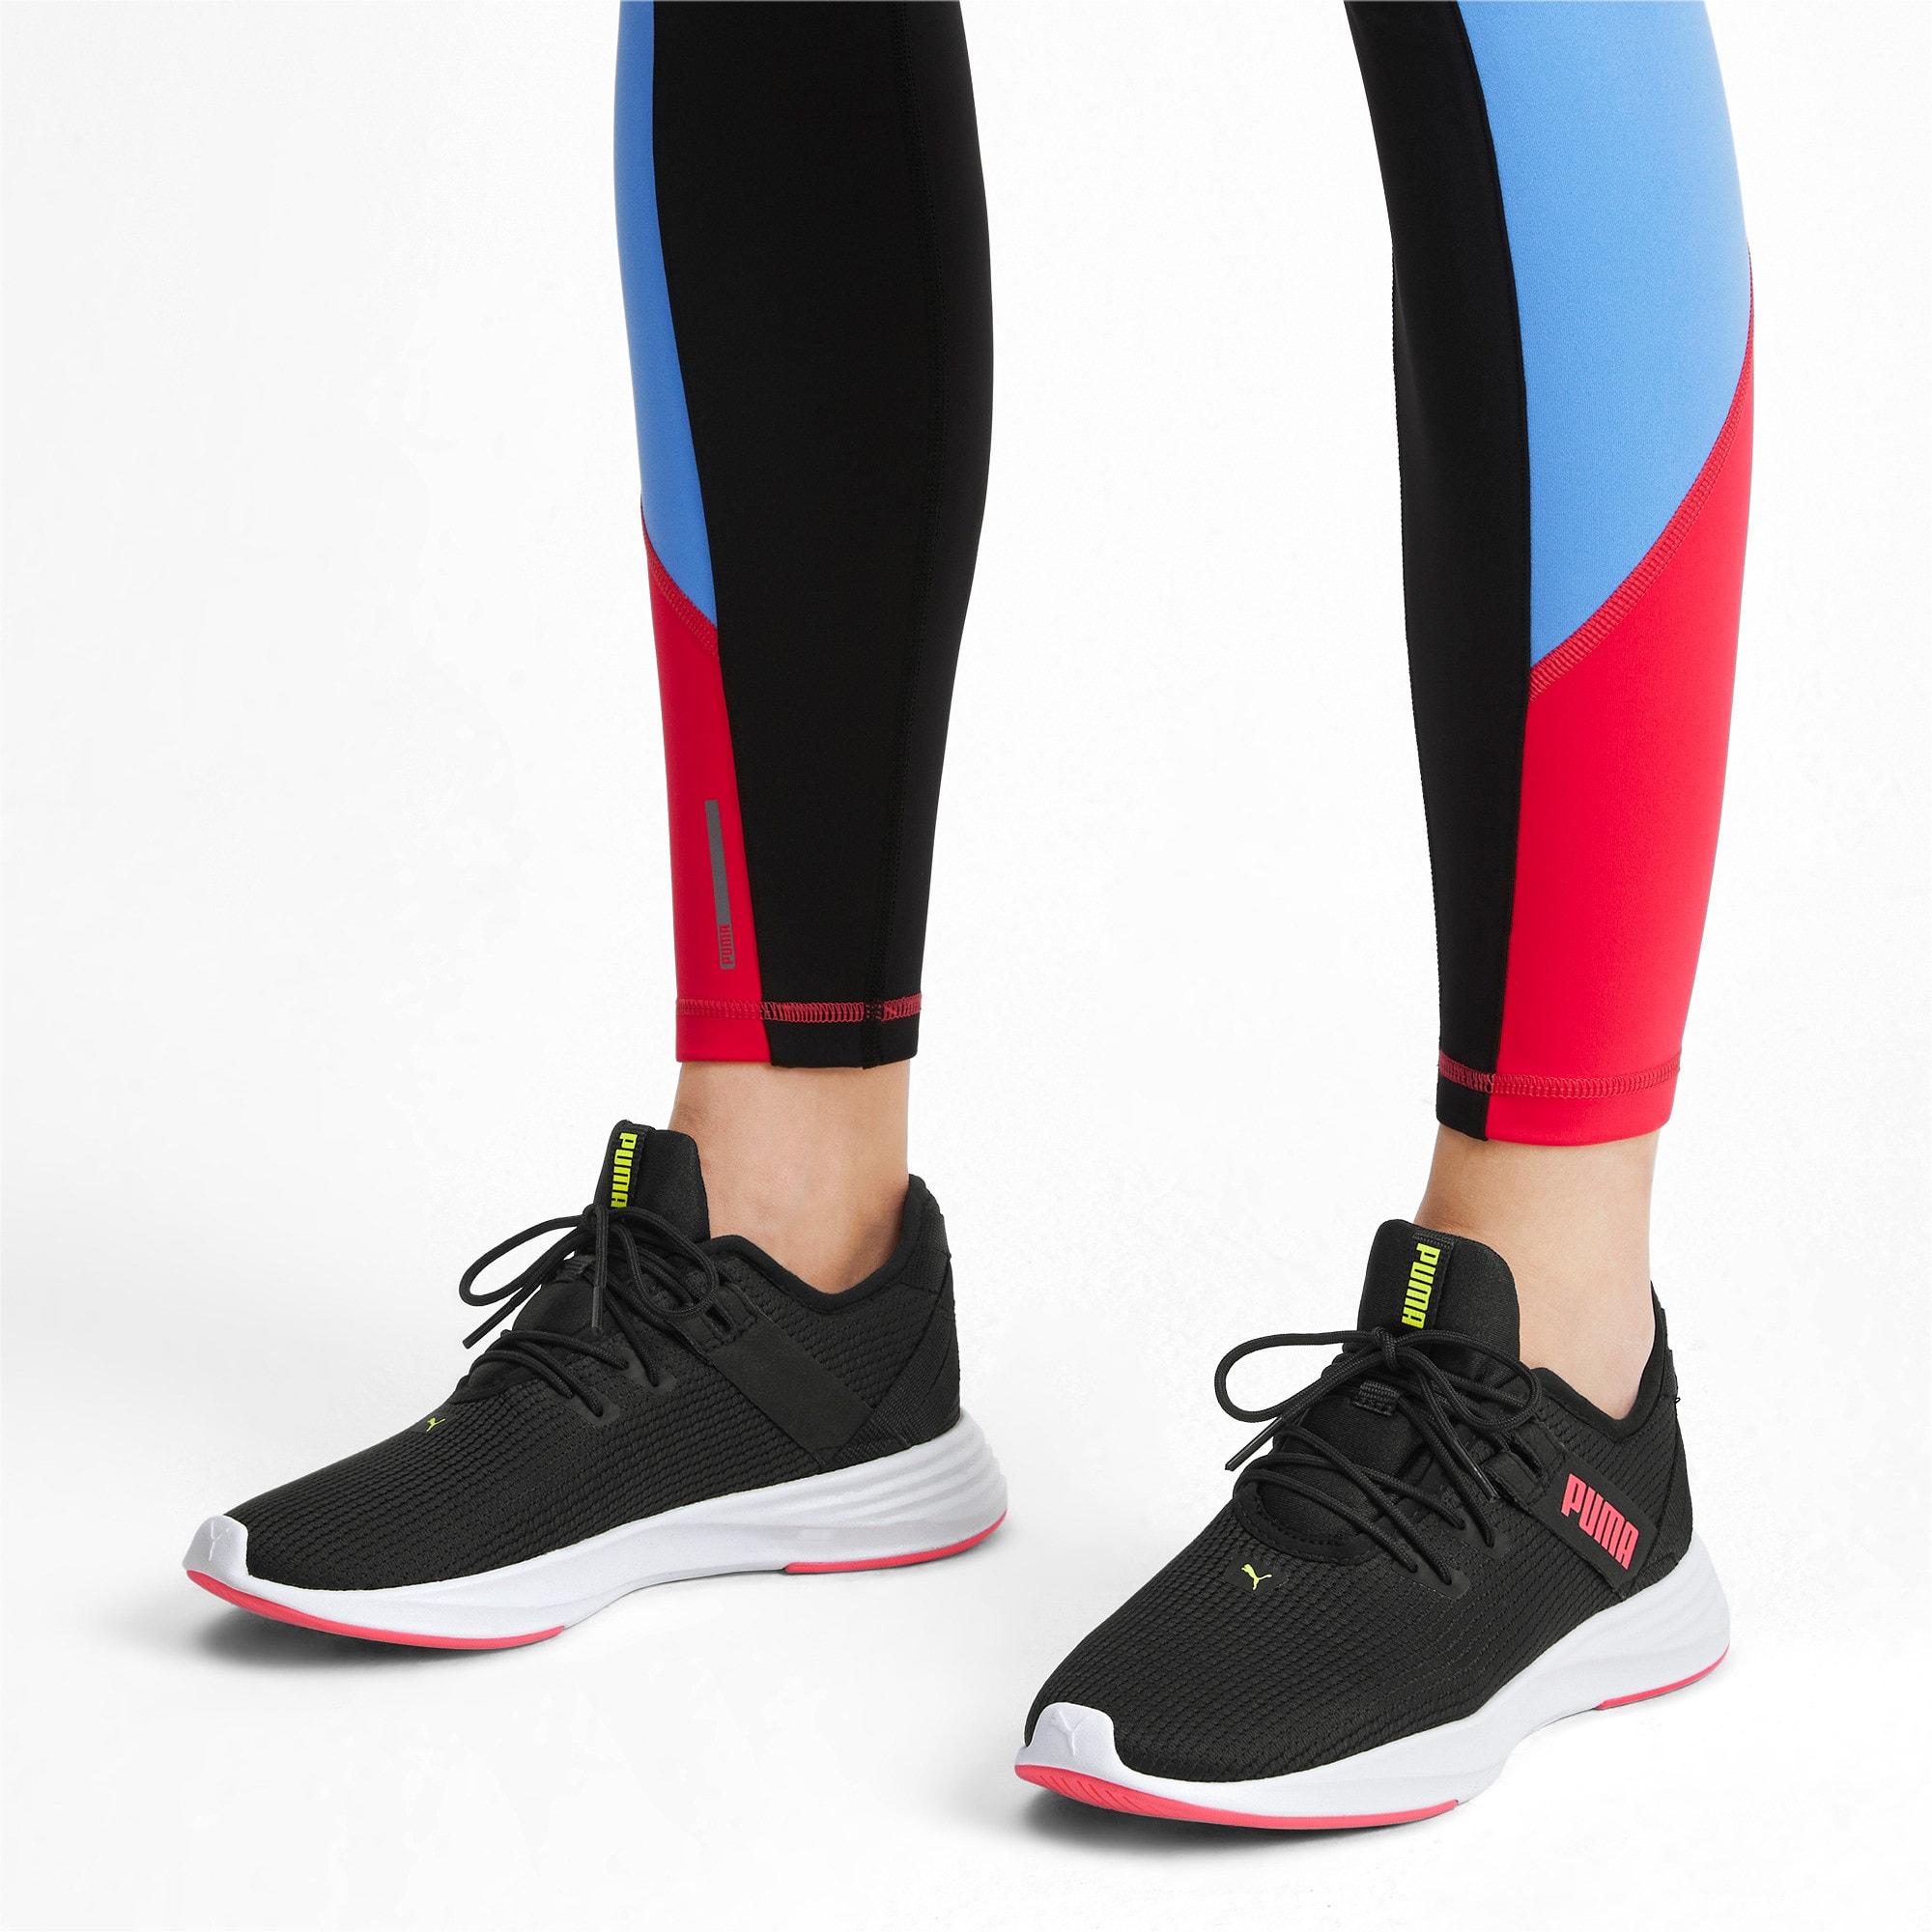 Thumbnail 2 of Radiate XT Women's Training Shoes, Puma Black-Pink Alert, medium